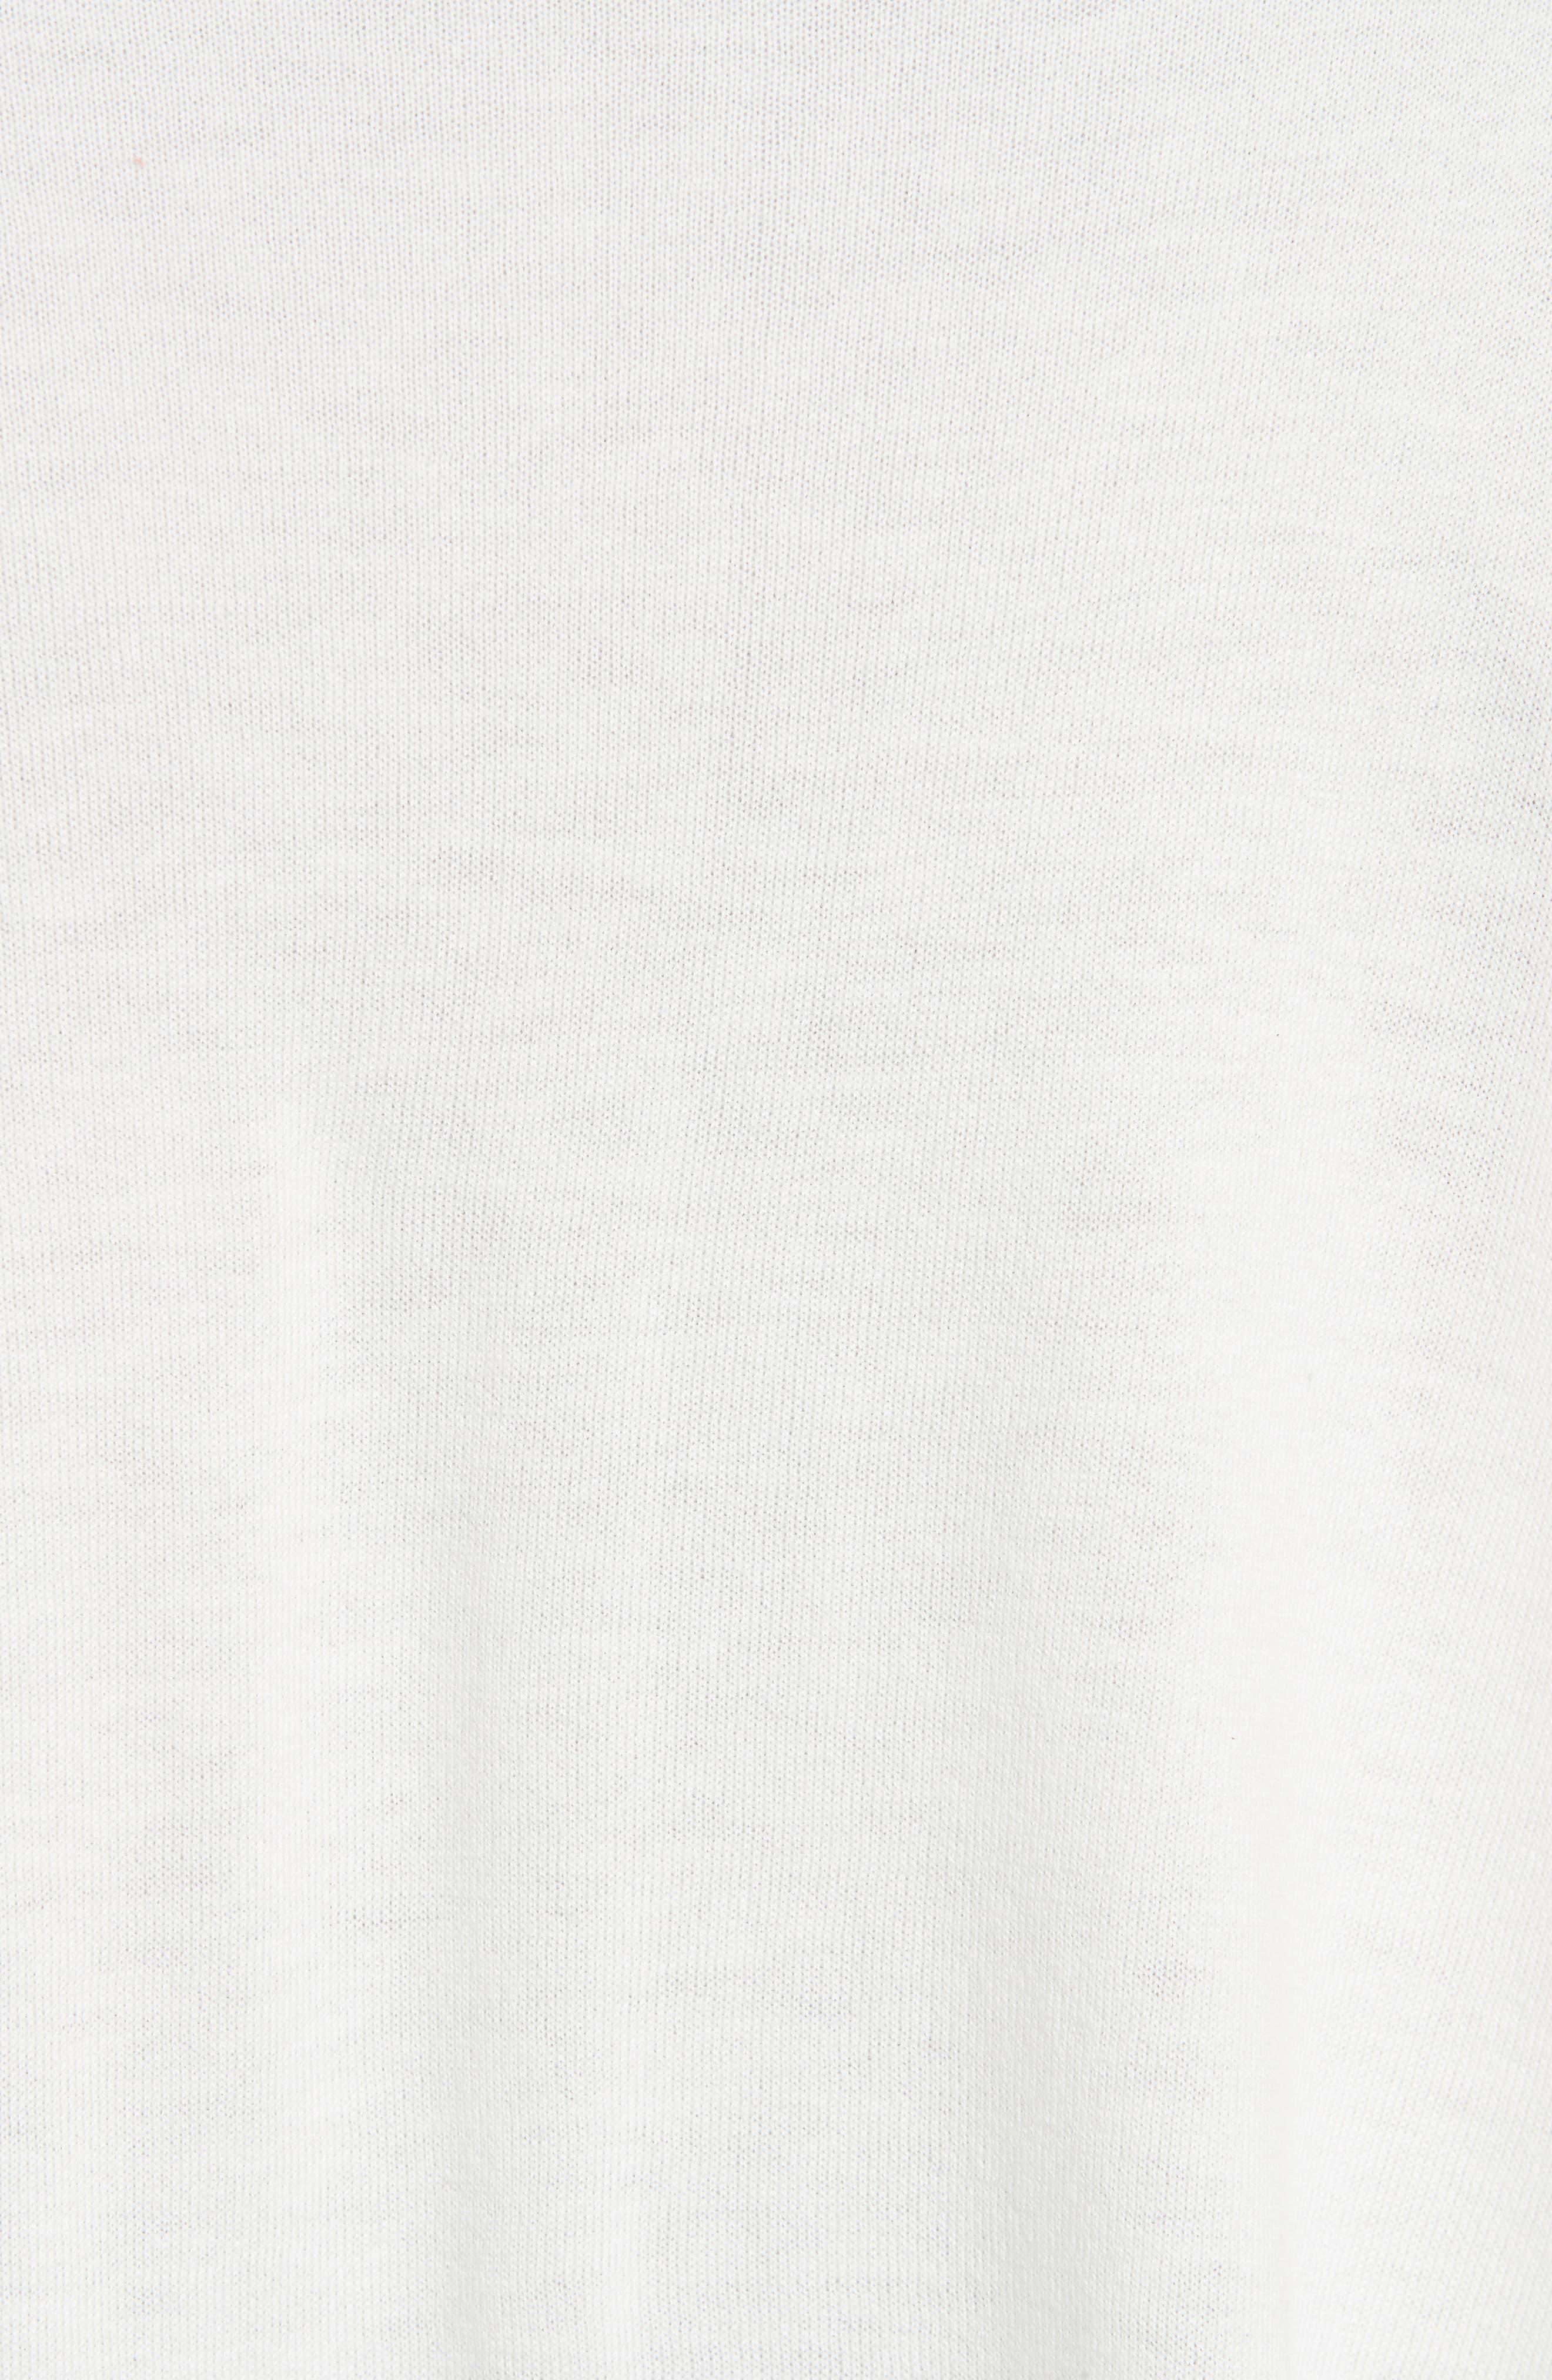 Marlis Knit Cardigan,                             Alternate thumbnail 14, color,